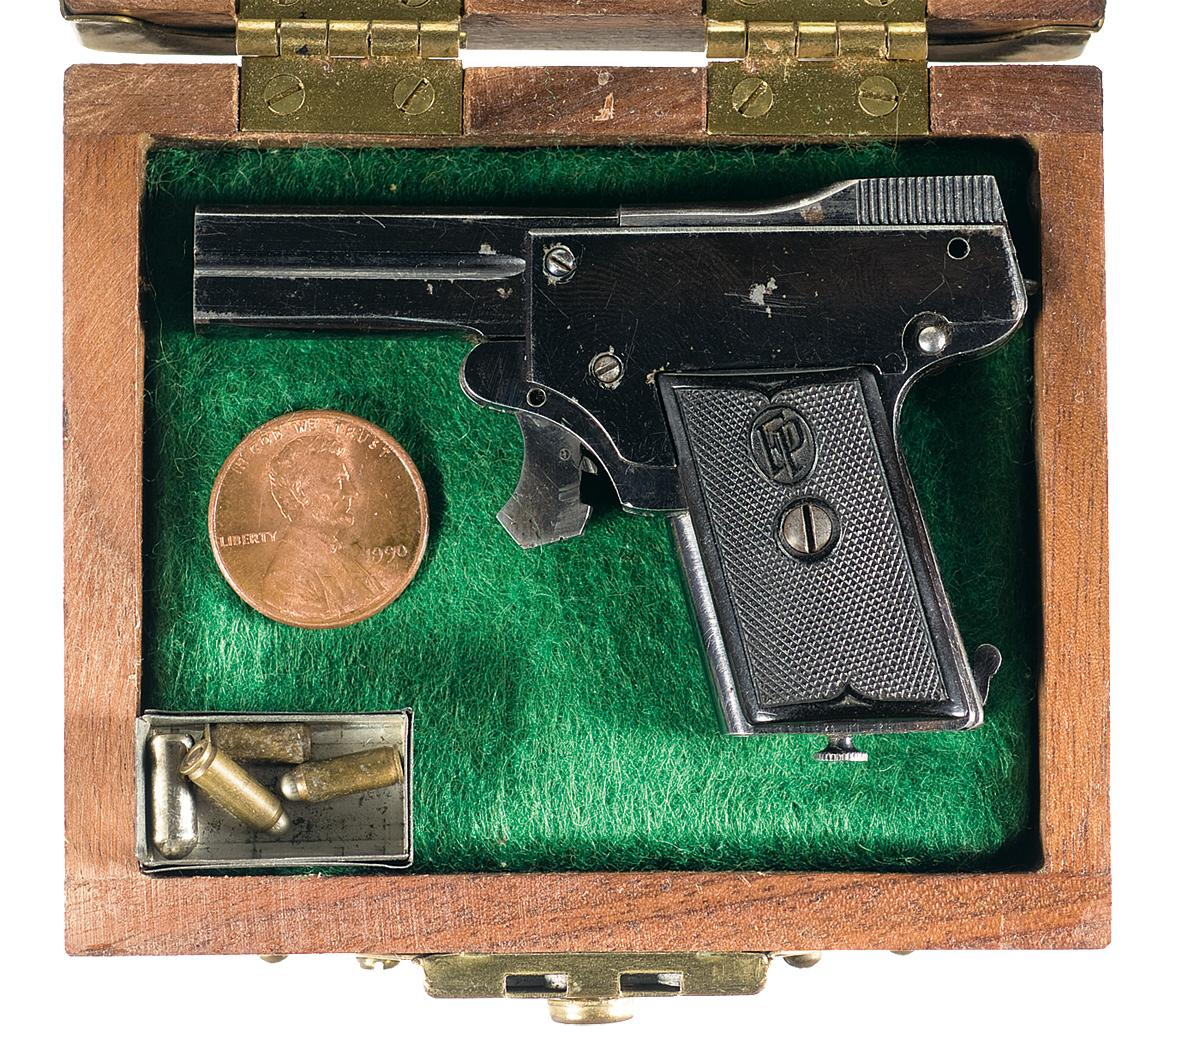 The 2mm Kolibri The World S Smallest Centerfire Pistol Laststandonzombieisland